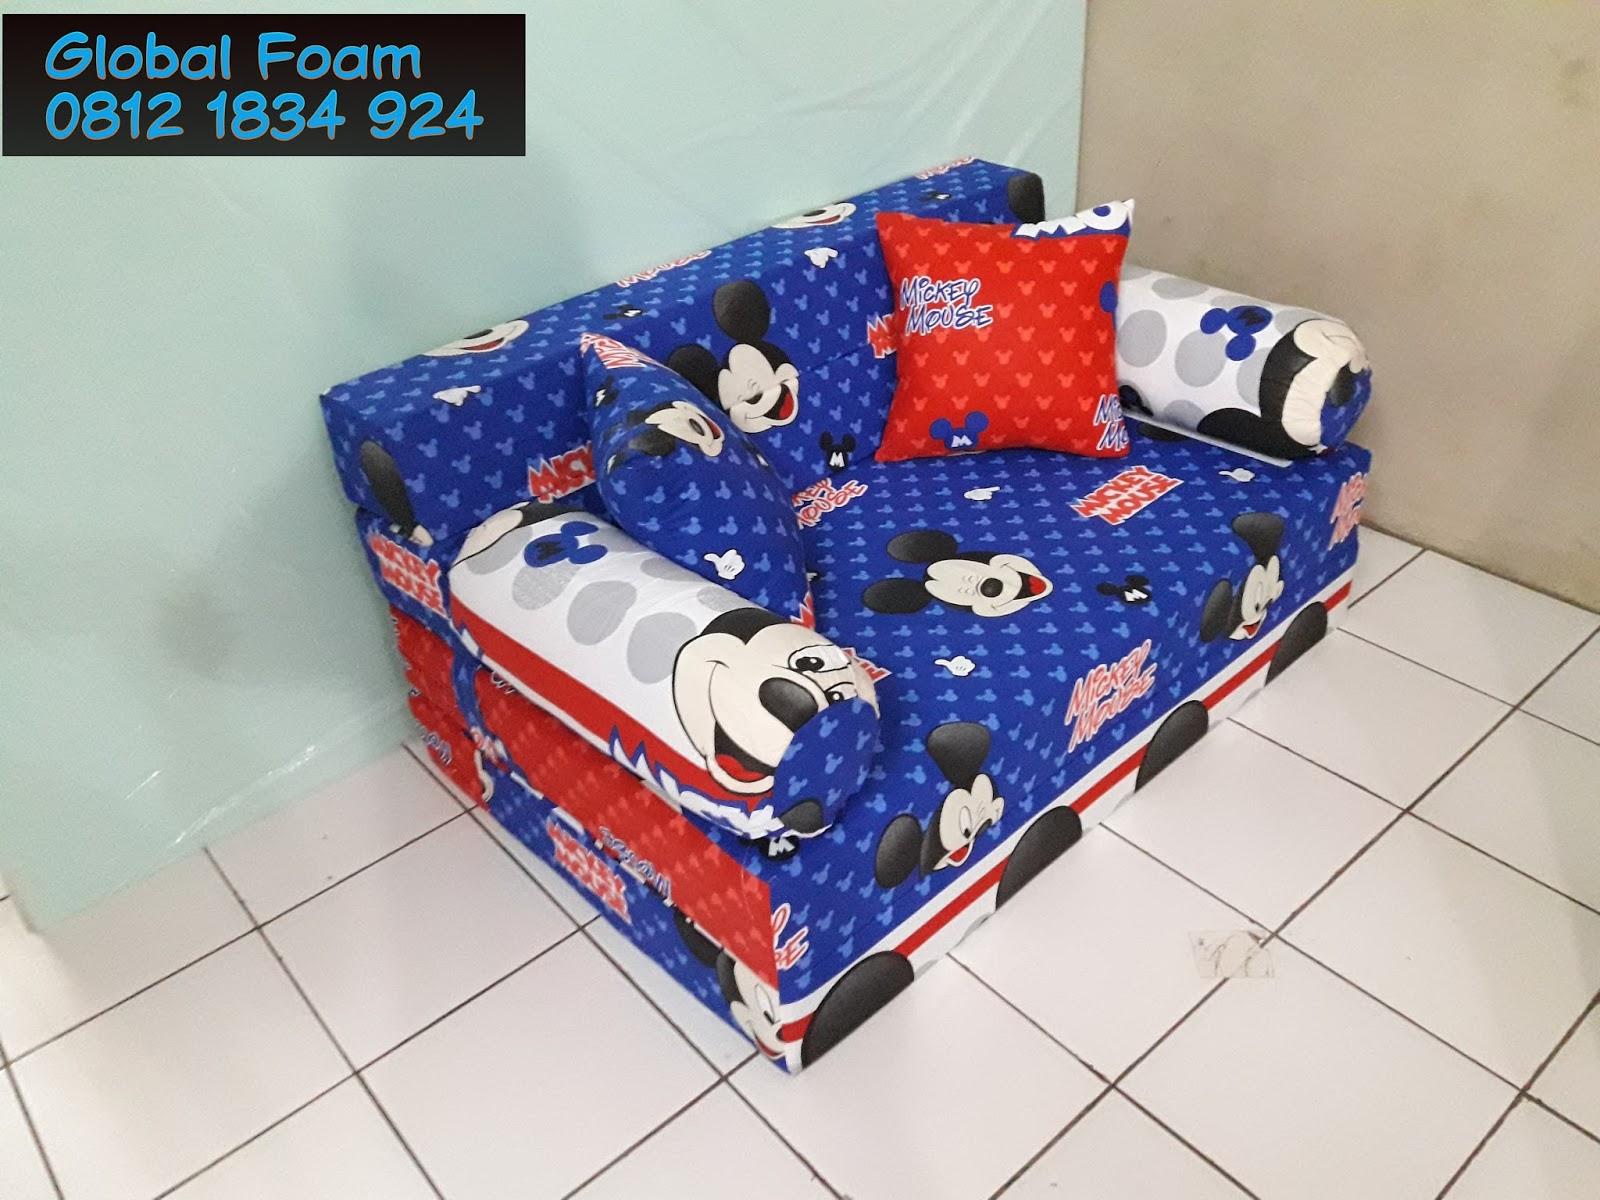 harga sofa bed inoac no 1 bench style uk lipat 1pcs bantal stkittsvilla